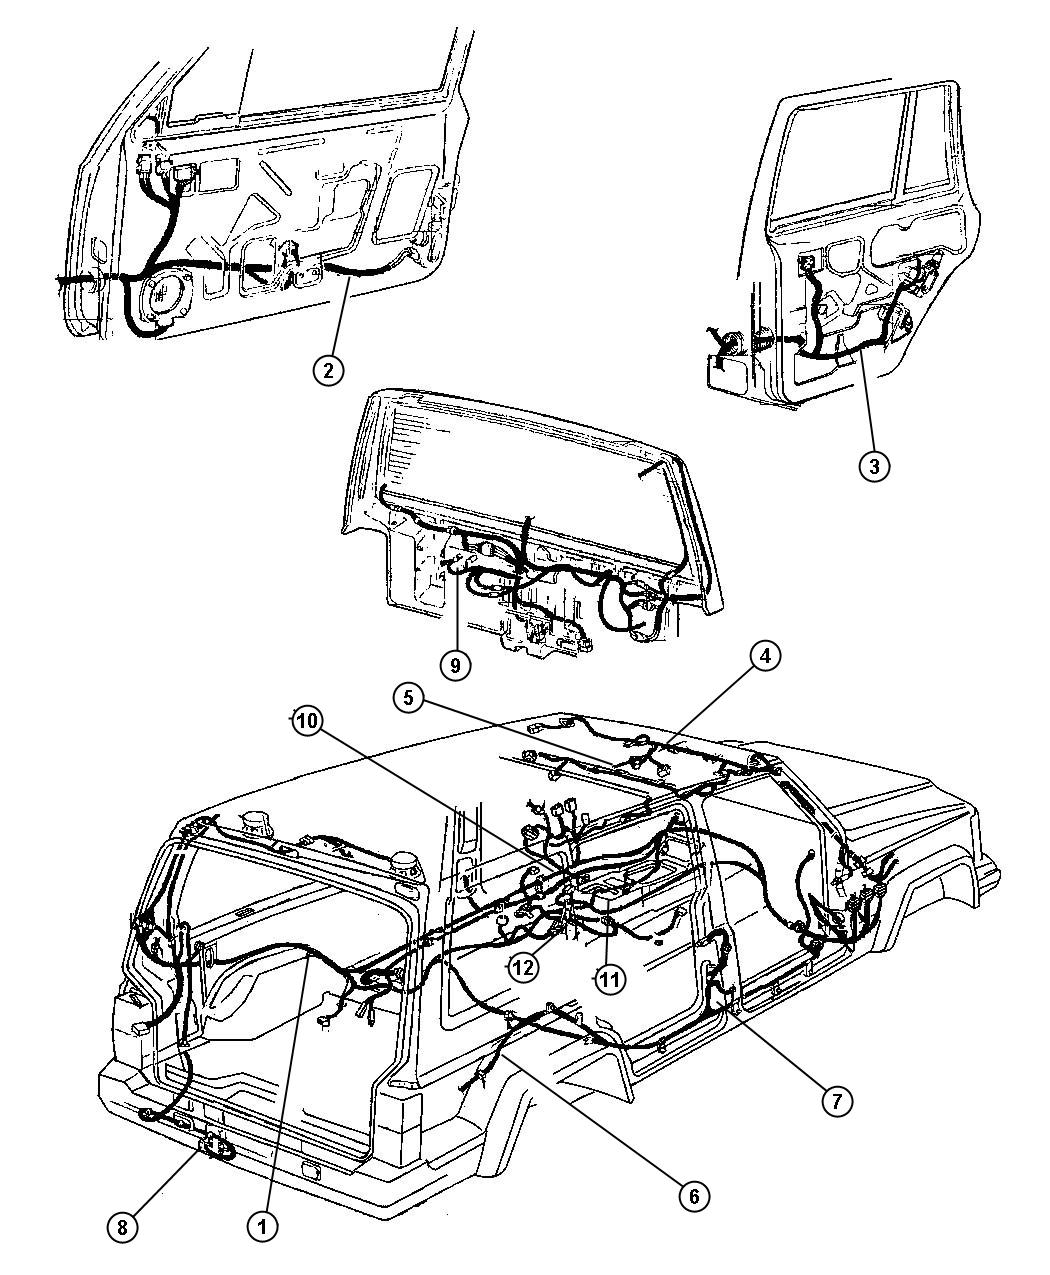 Wiring Body & Accessories